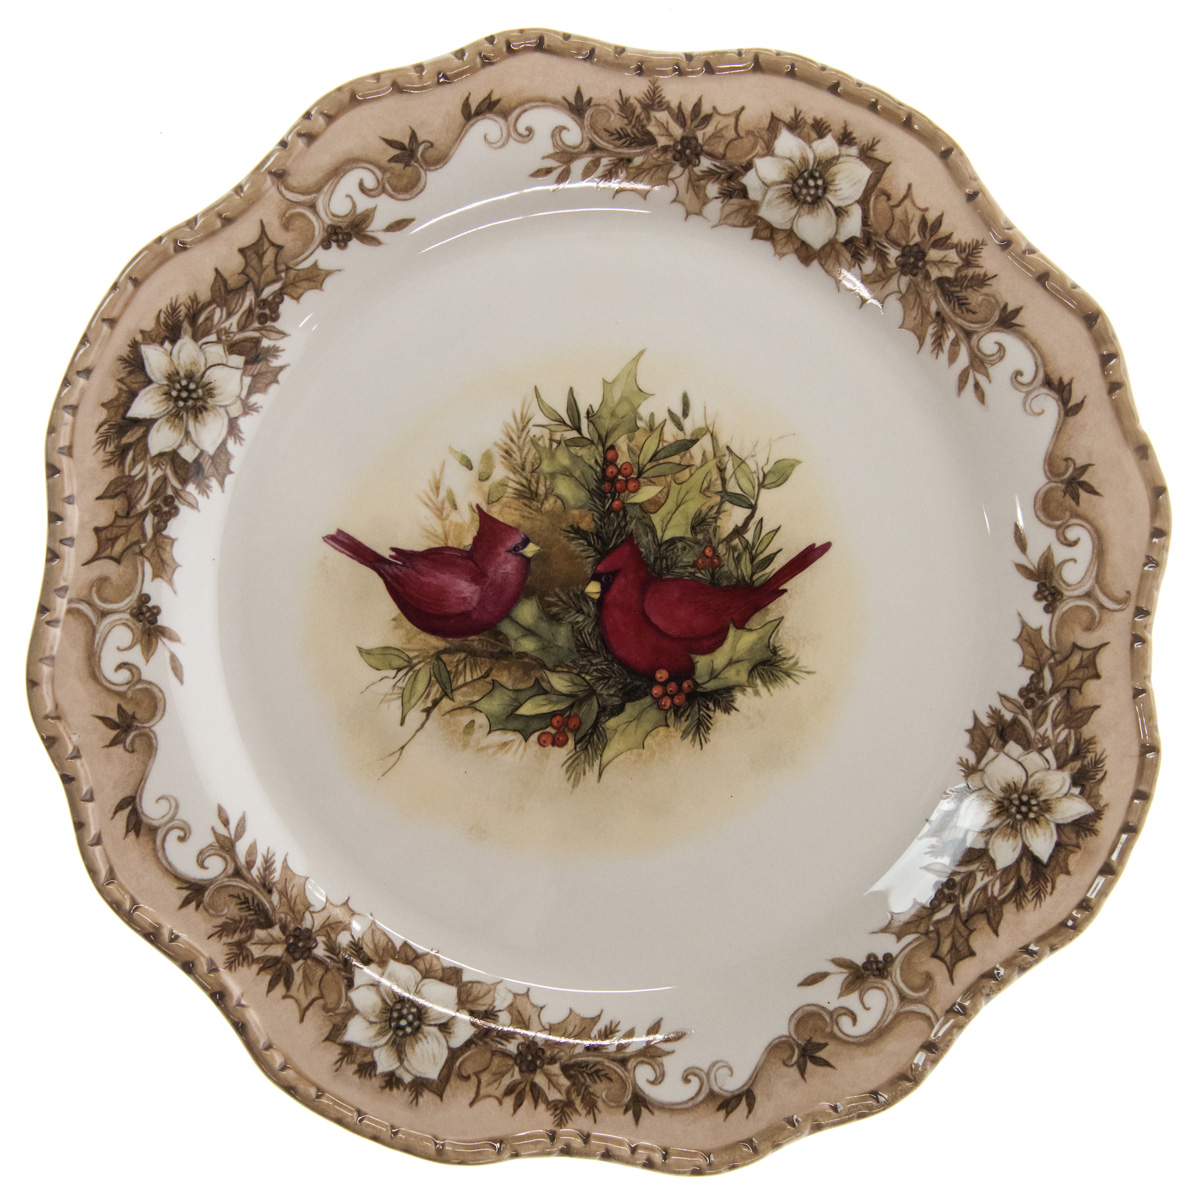 Woodland Cardinal Stoneware Dinner Plate  sc 1 st  Cracker Barrel & Dinnerware Serveware | Kitchen Dining | Home Furniture - Cracker ...